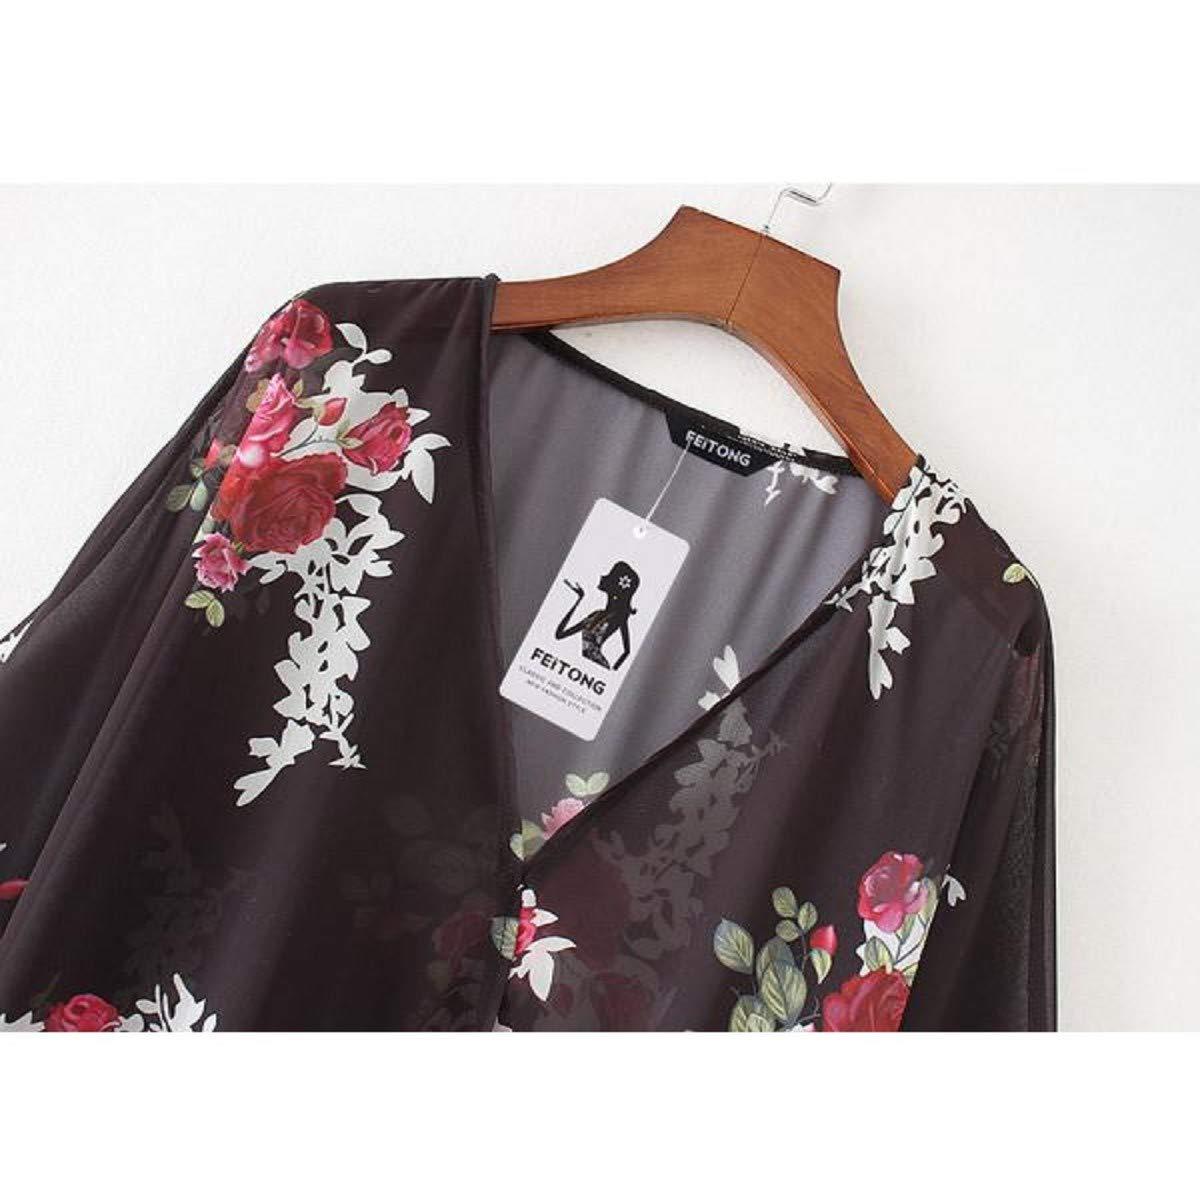 OTINICE Women's Chiffon Kimono Cardigans Floral Puff Sleeve Casual Loose Swimwear Cover ups Black by OTINICE (Image #5)